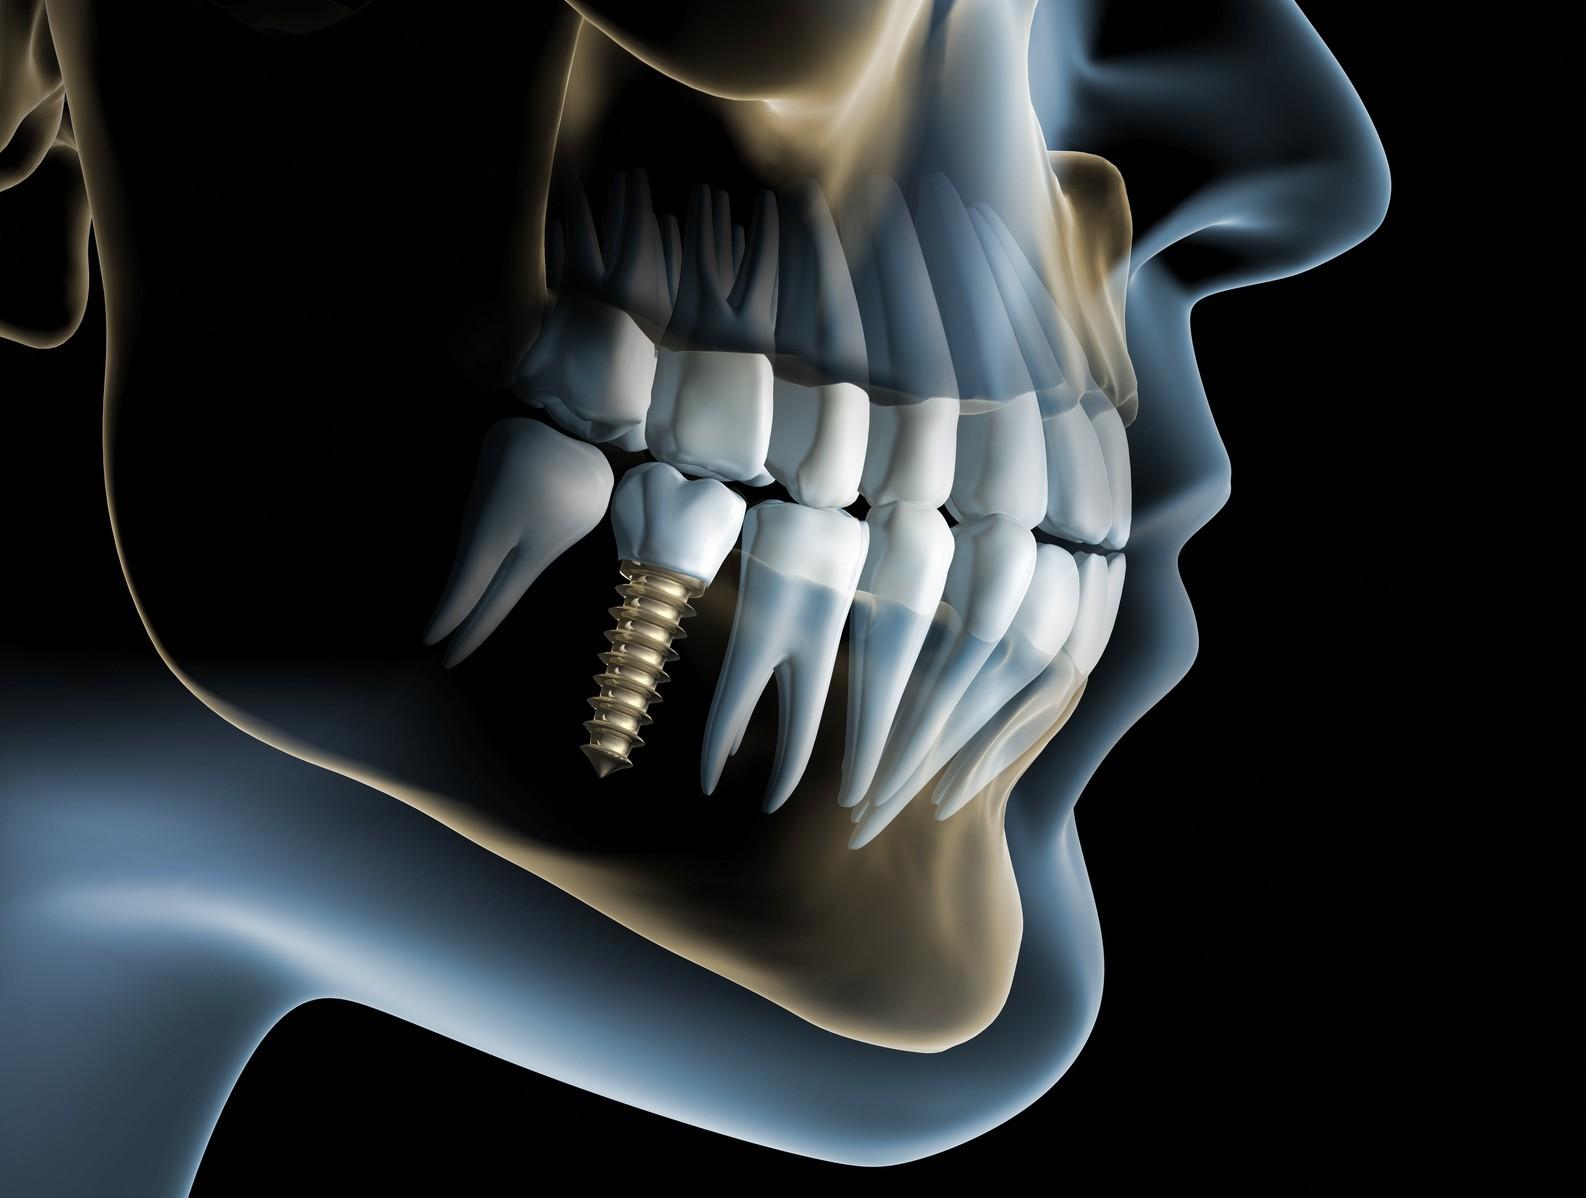 KG Dental-Unsere Klinik